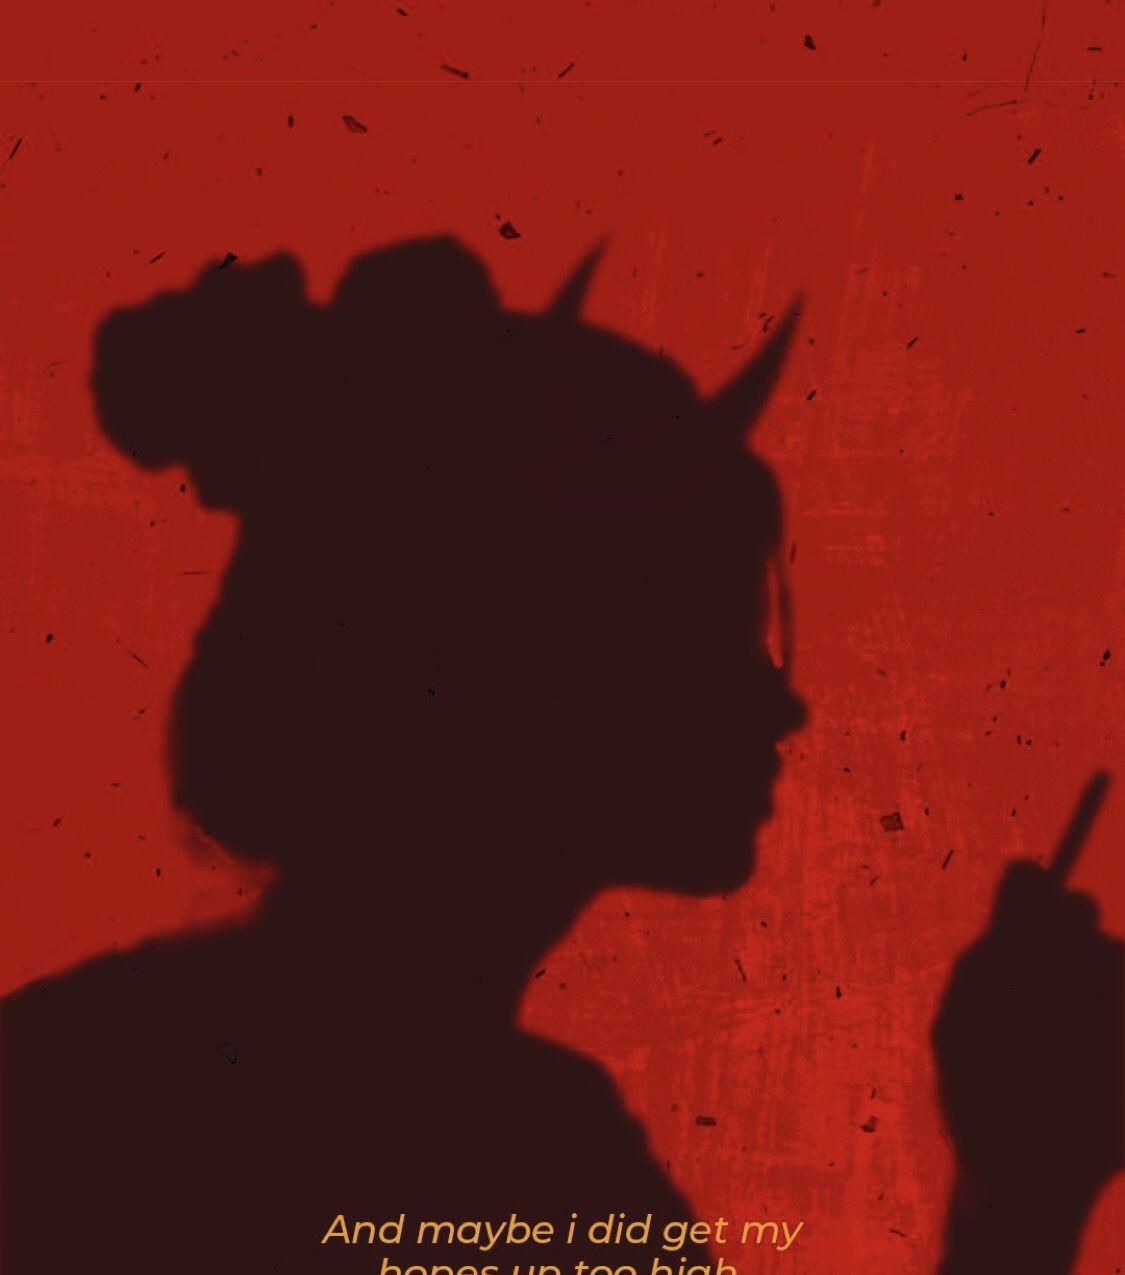 Download Bad Boy Devil Boy Aesthetic Wallpaper Gif